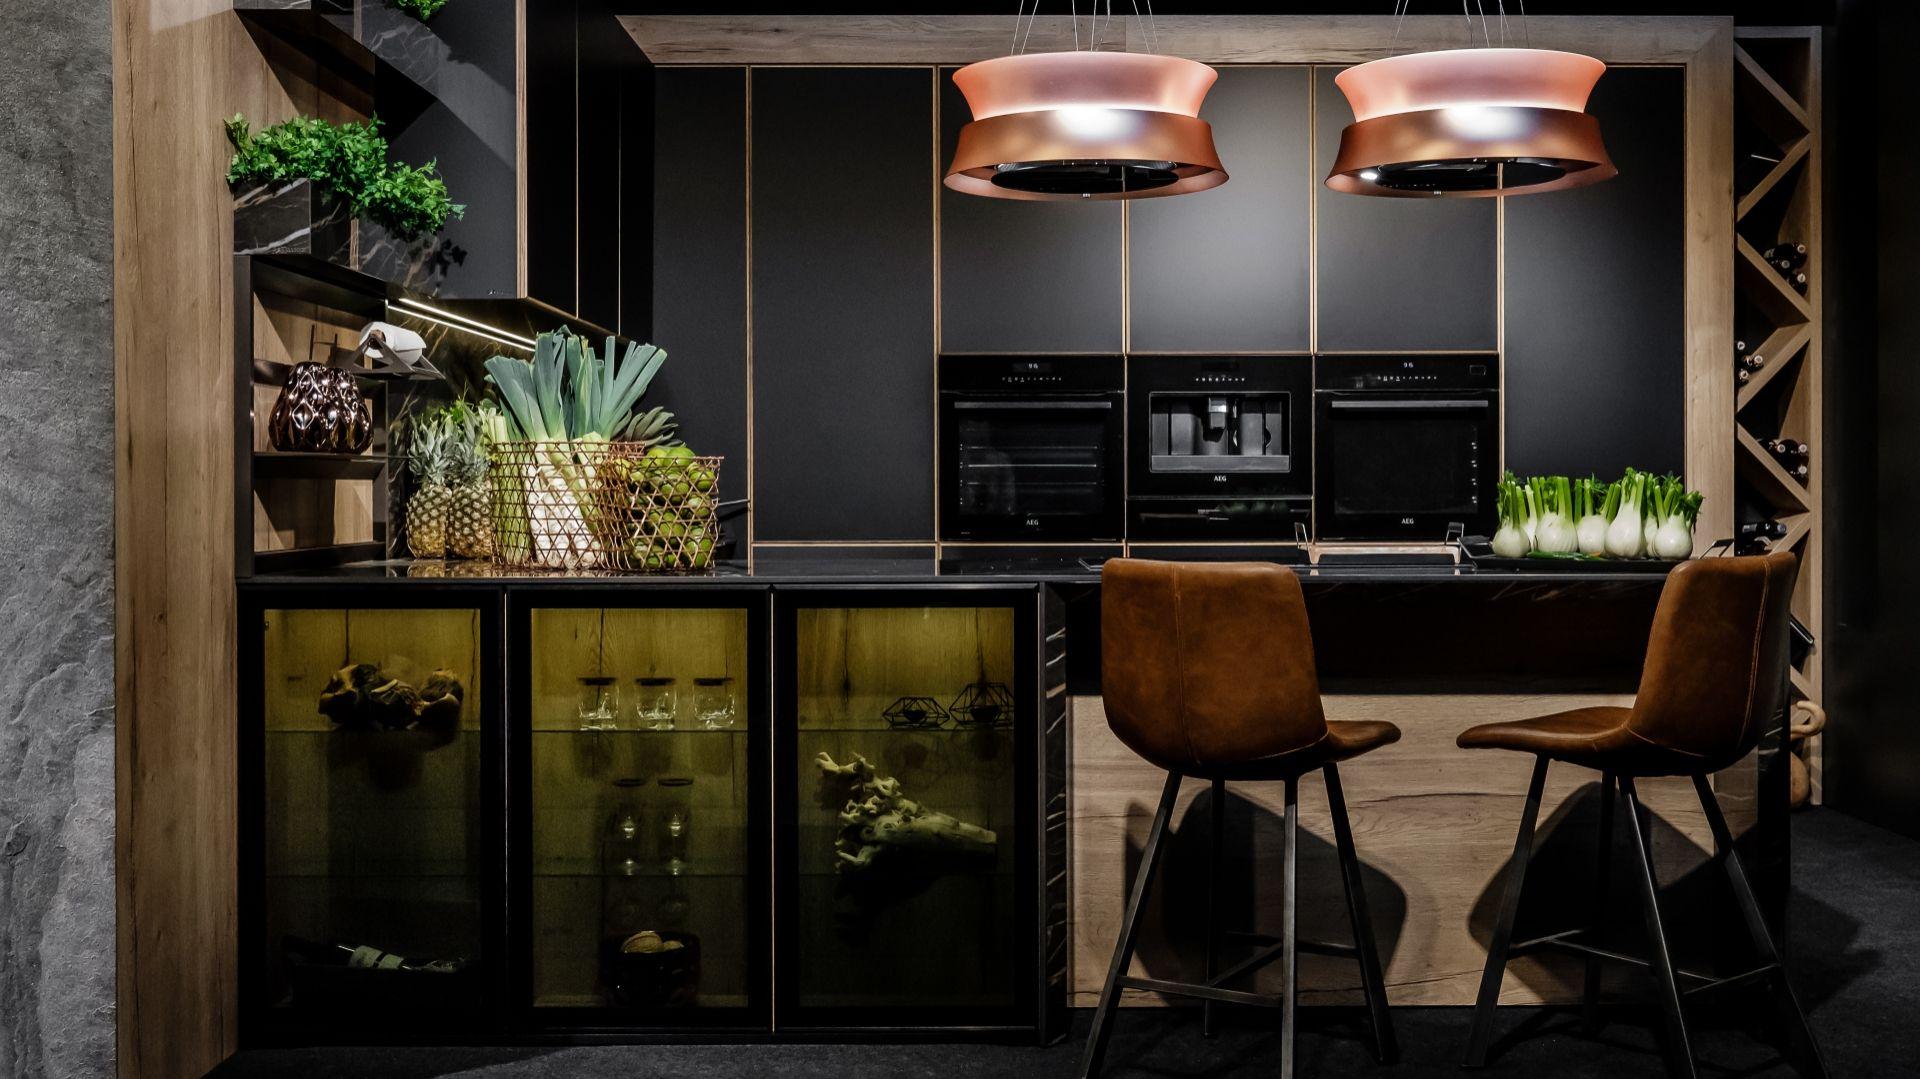 Kolekcja Manu/A&K. Produkt zgłoszony do konkursu Dobry Design 2019.